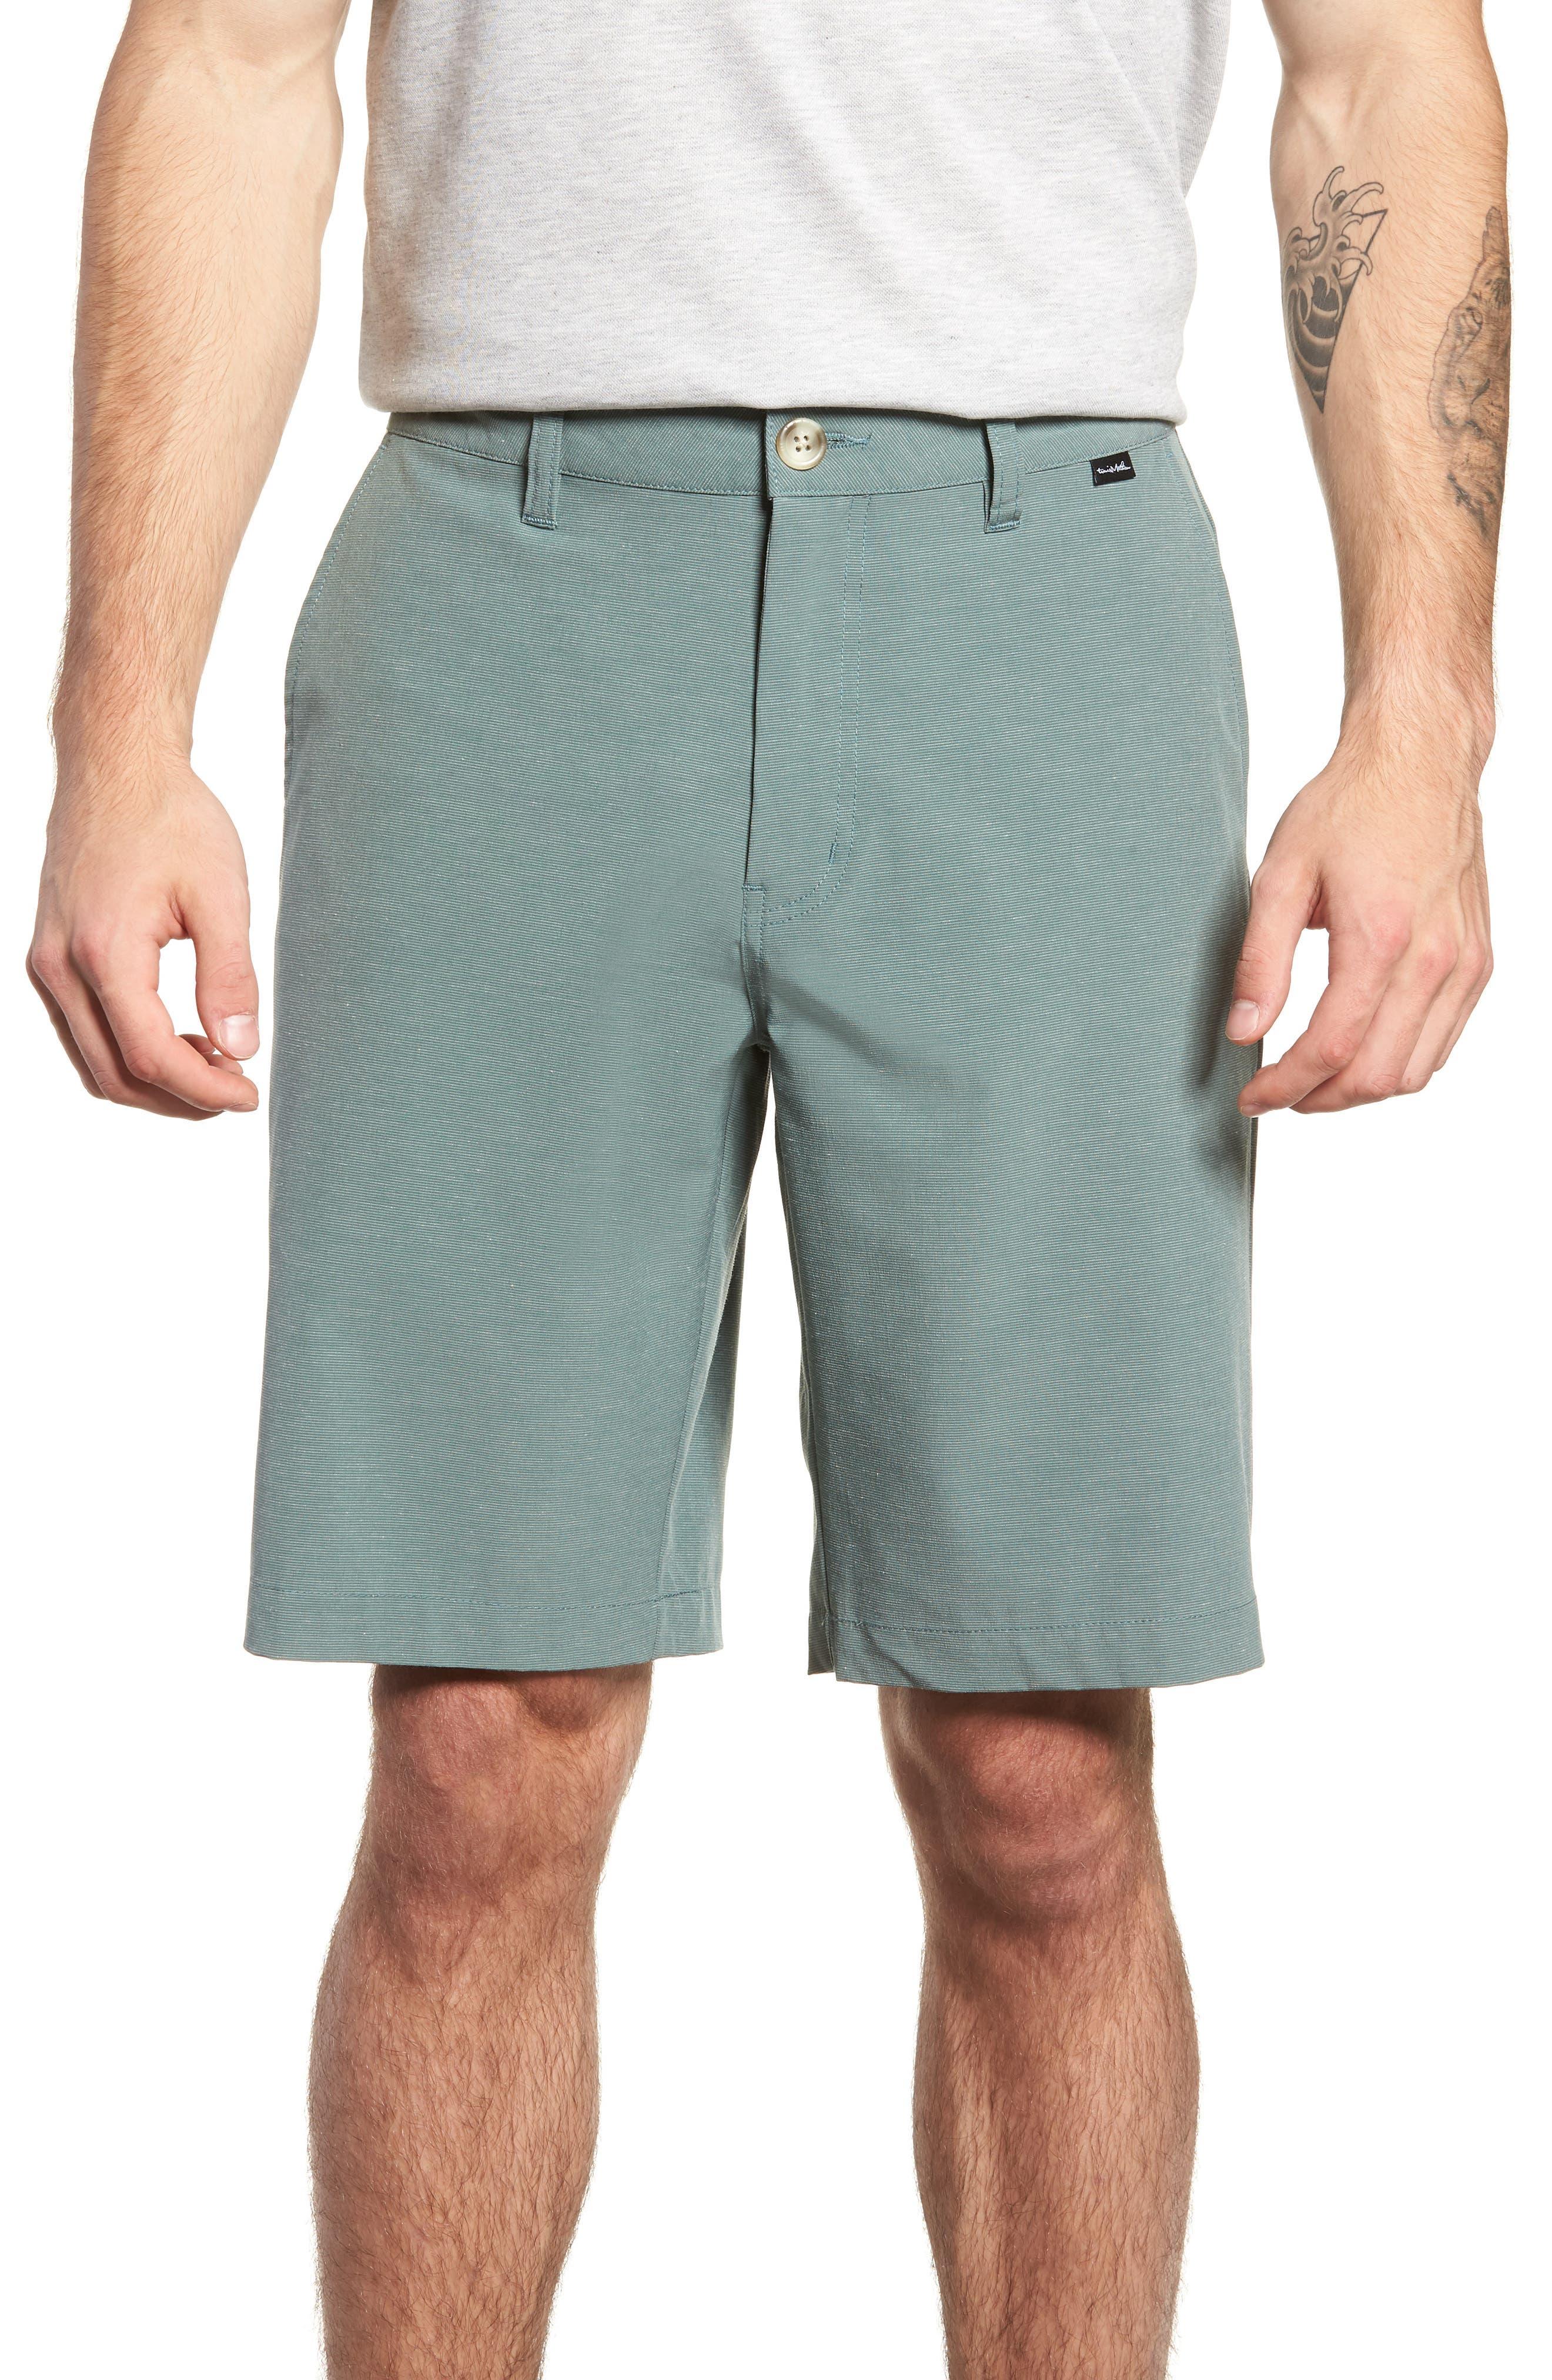 Revival Shorts,                         Main,                         color, BALSAM GREEN